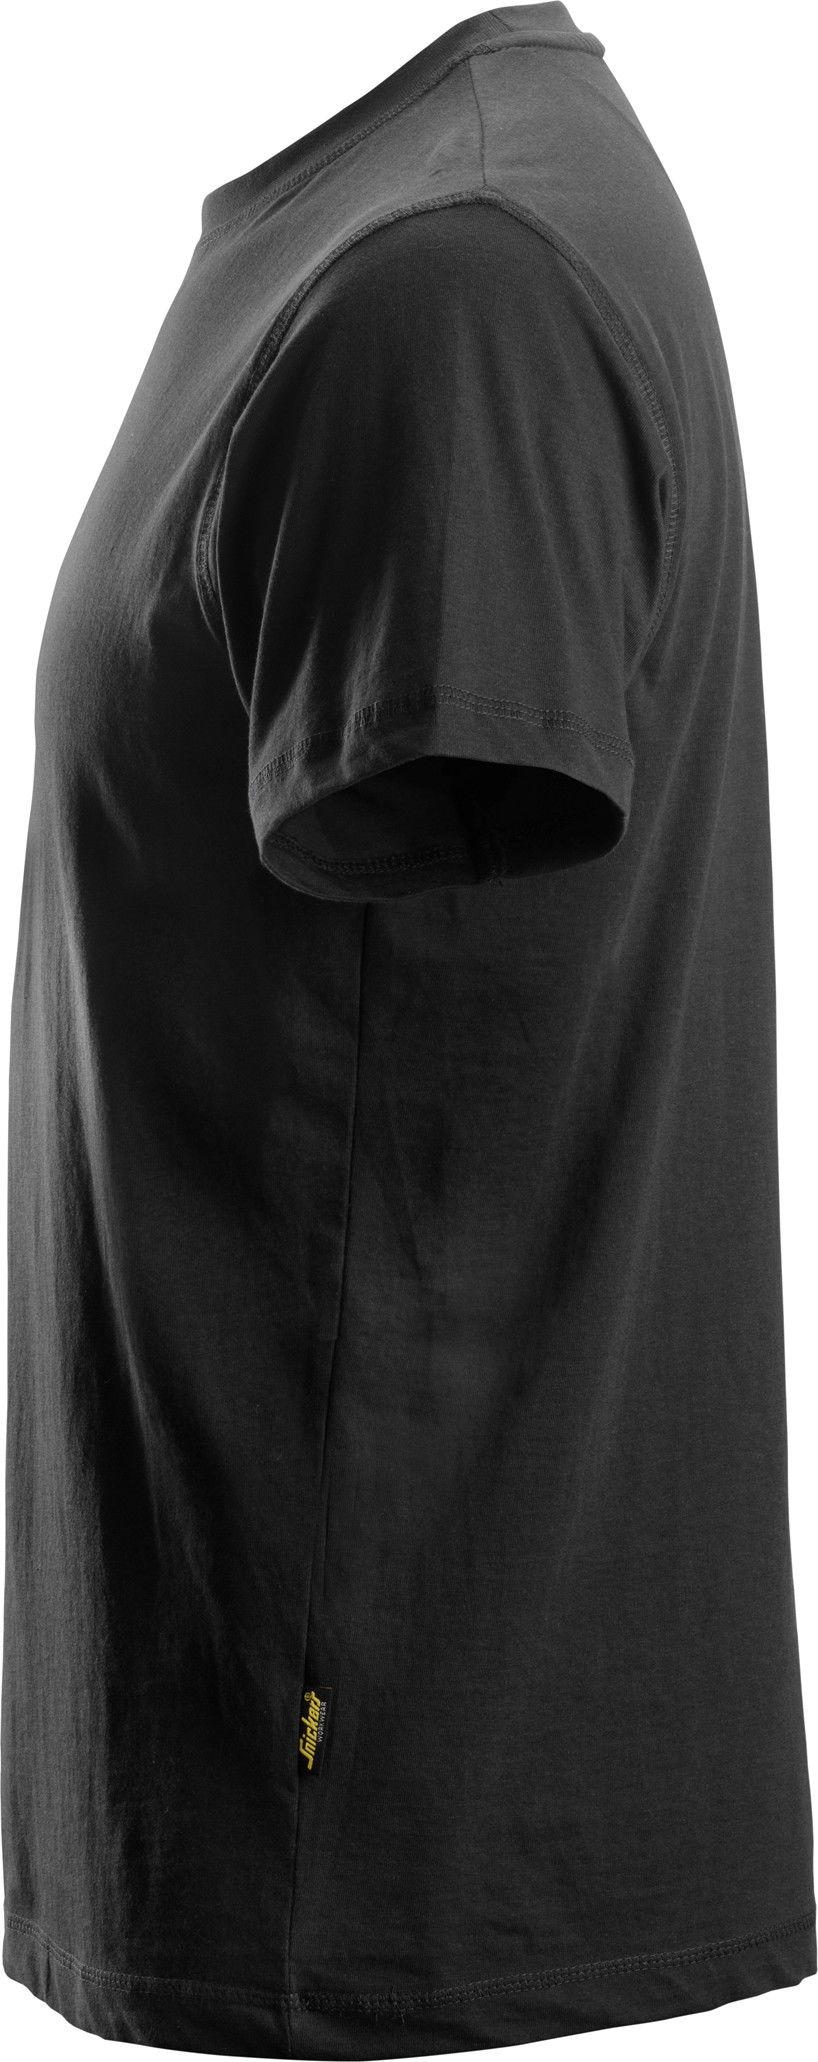 T-shirt koszulka męska, czarna, rozmiar XS, 2502 Snickers [25020400003]